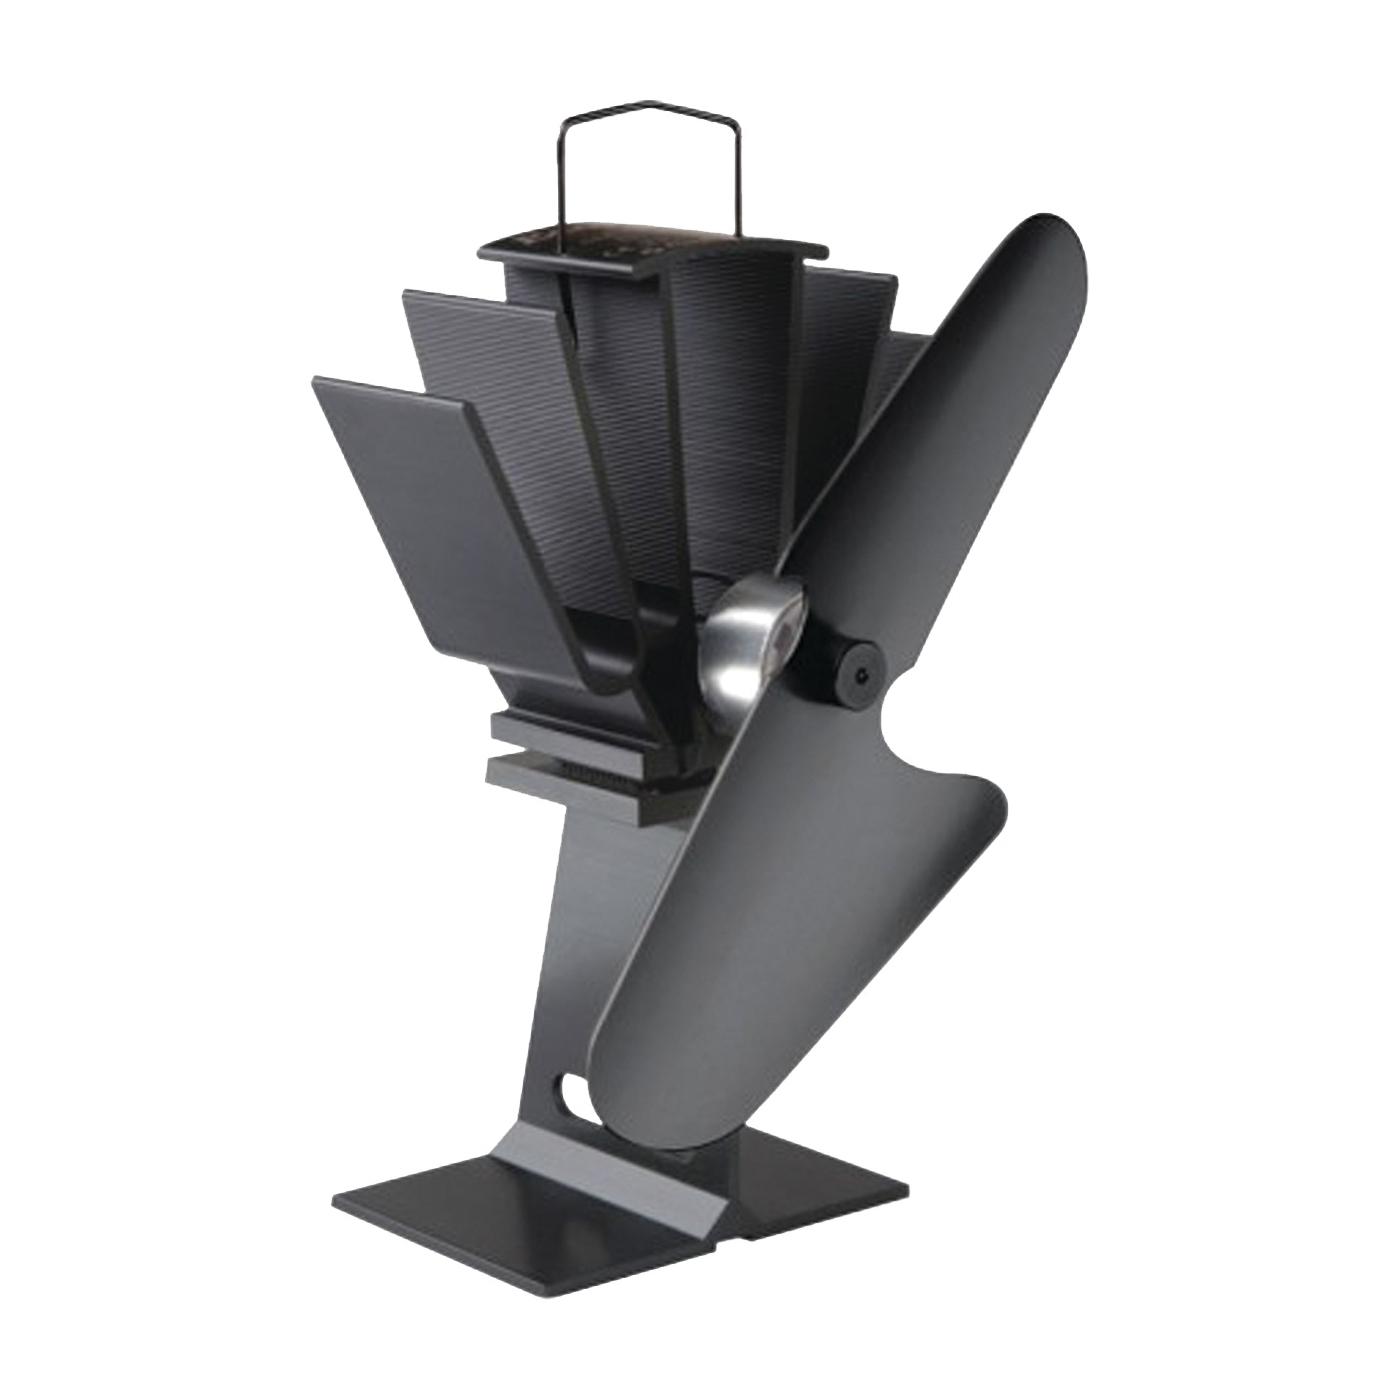 Picture of Ecofan 800CAXBX Stove Fan, 100 cfm Air, Black